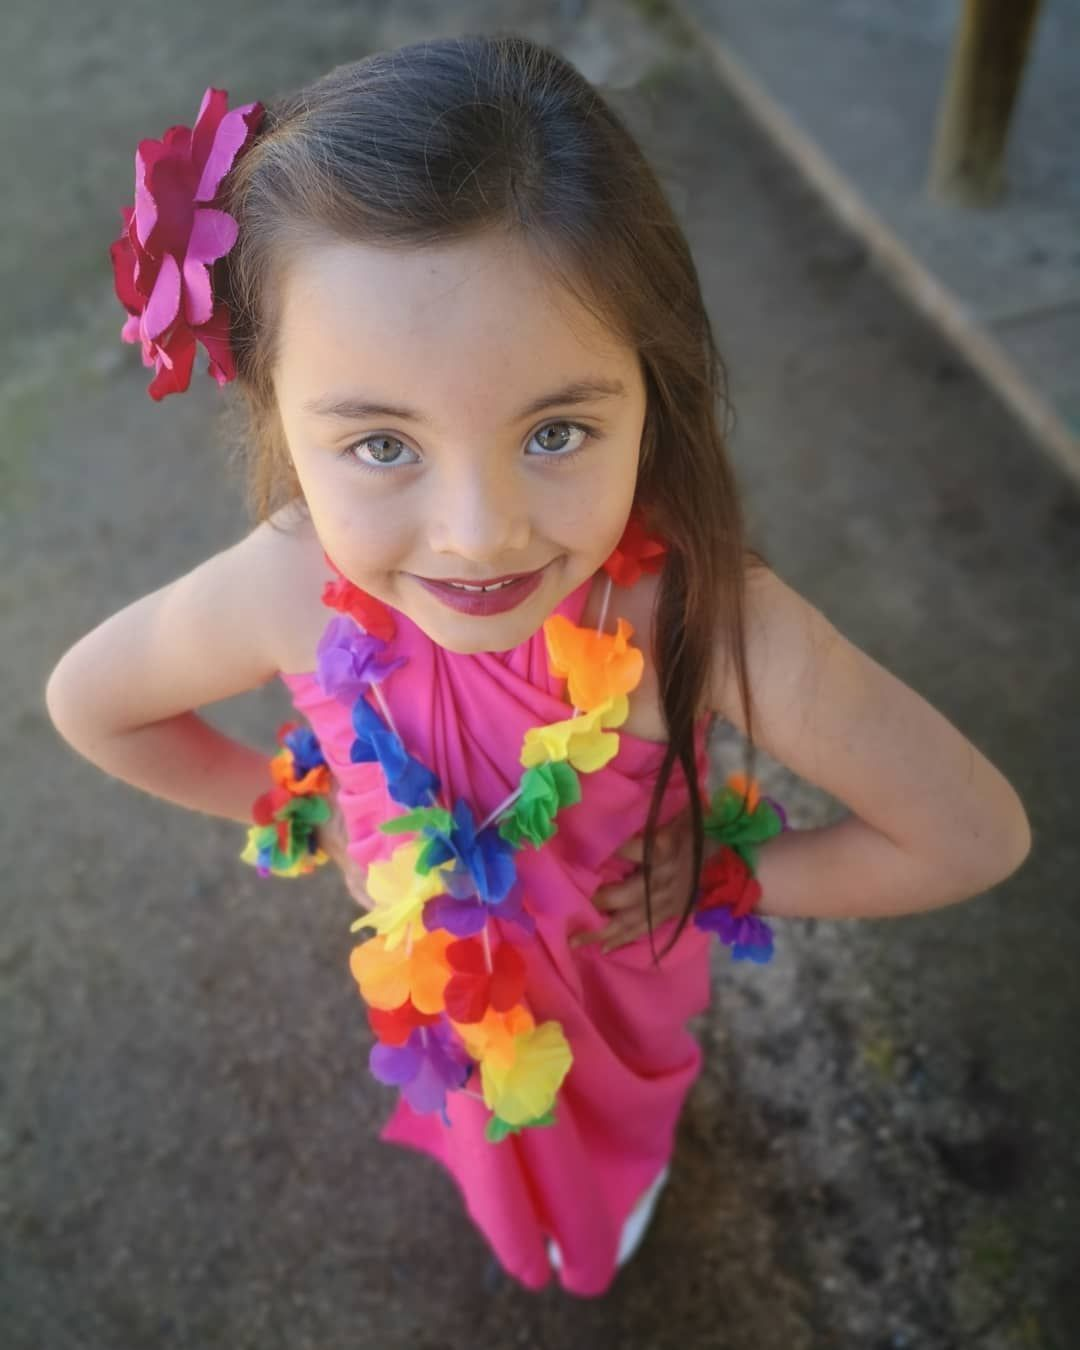 Inlove 🇨🇱💓🥰 . . . . . . . #chileno #chilenidad #folk #music #folklore #inlove #tío  #sobrinos #Family #familia #amor #love #instagram #followme #style #follow #instadaily #life #moments #love #instantes #inspiration